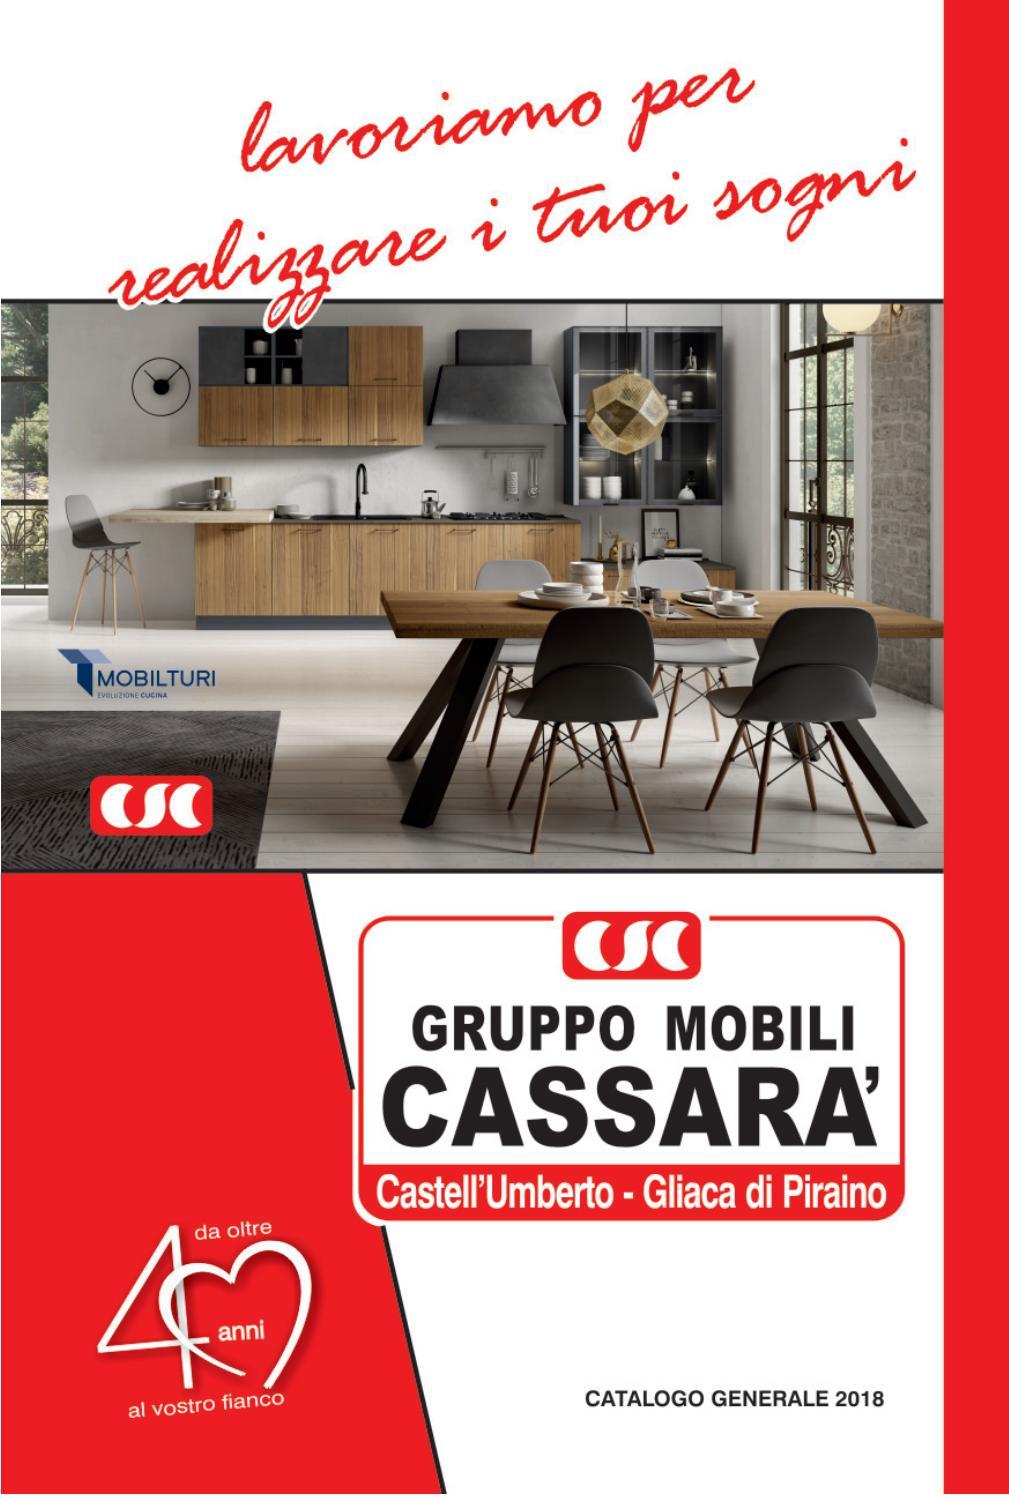 Gruppo Mobili Cassara.Cassara Catalogo 2018 By Agenziawebdeveloper Issuu